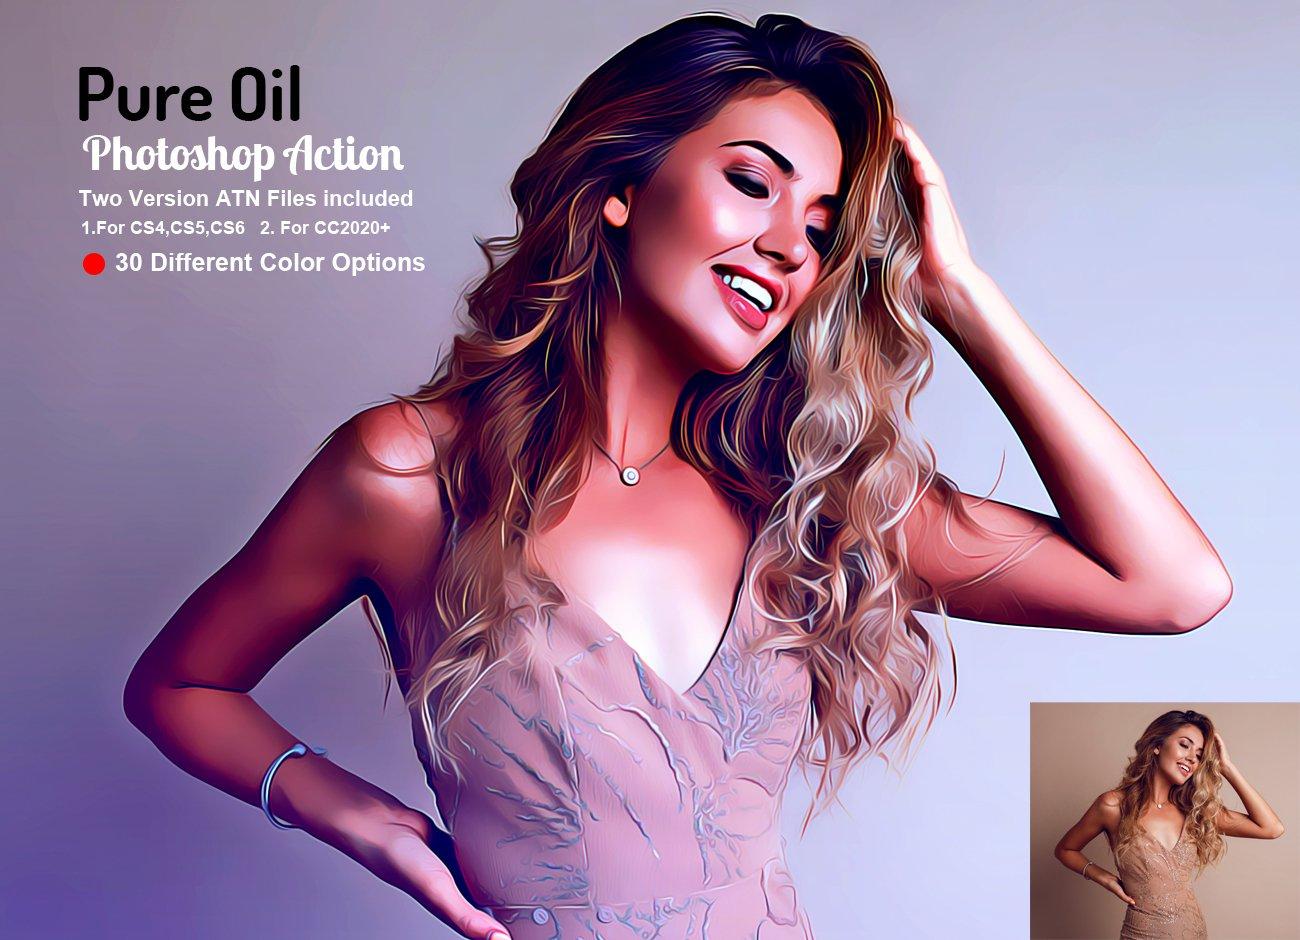 逼真油画效果照片处理滤镜PS动作模板素材 Pure Oil Photoshop Action插图